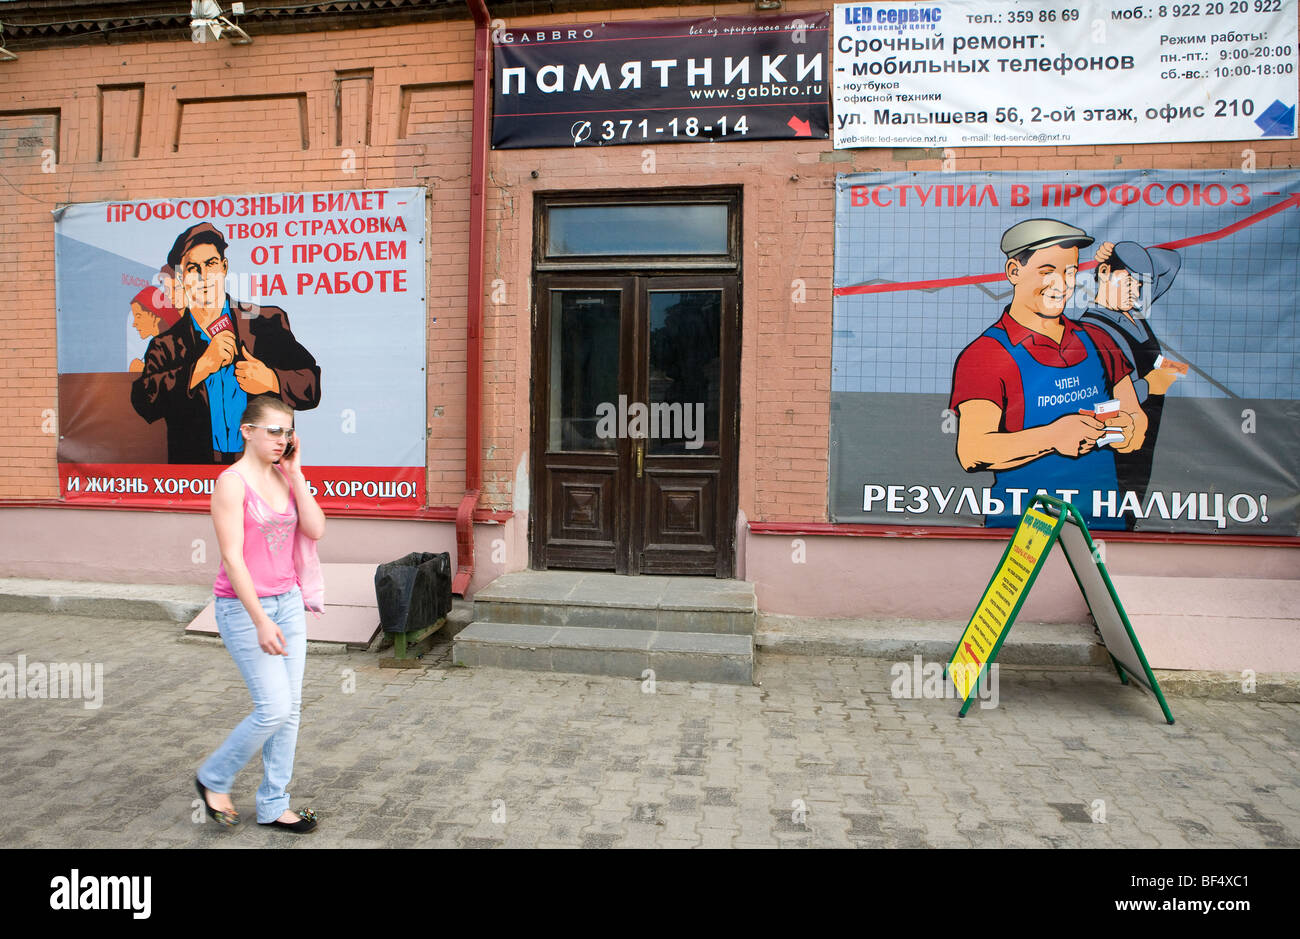 soviet union propaganda posters ekaterinburg the urals - Stock Image